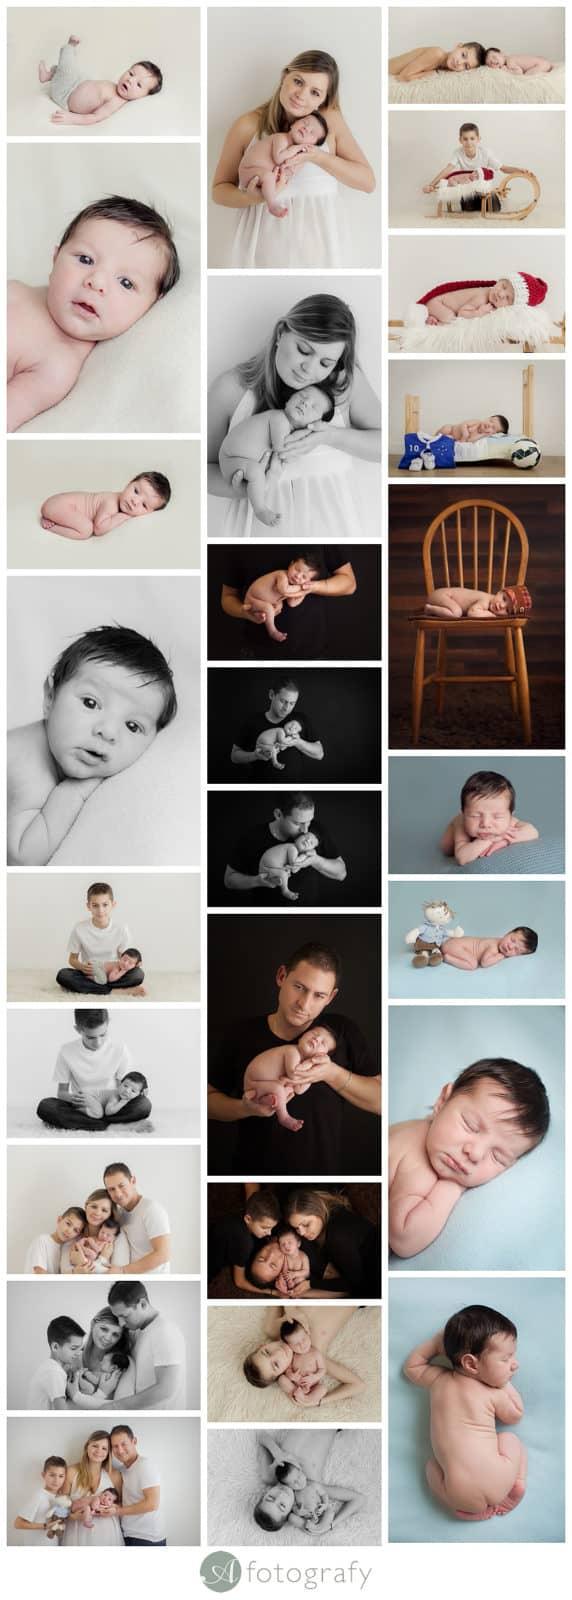 edinburgh newborn photo sessions-002 copy